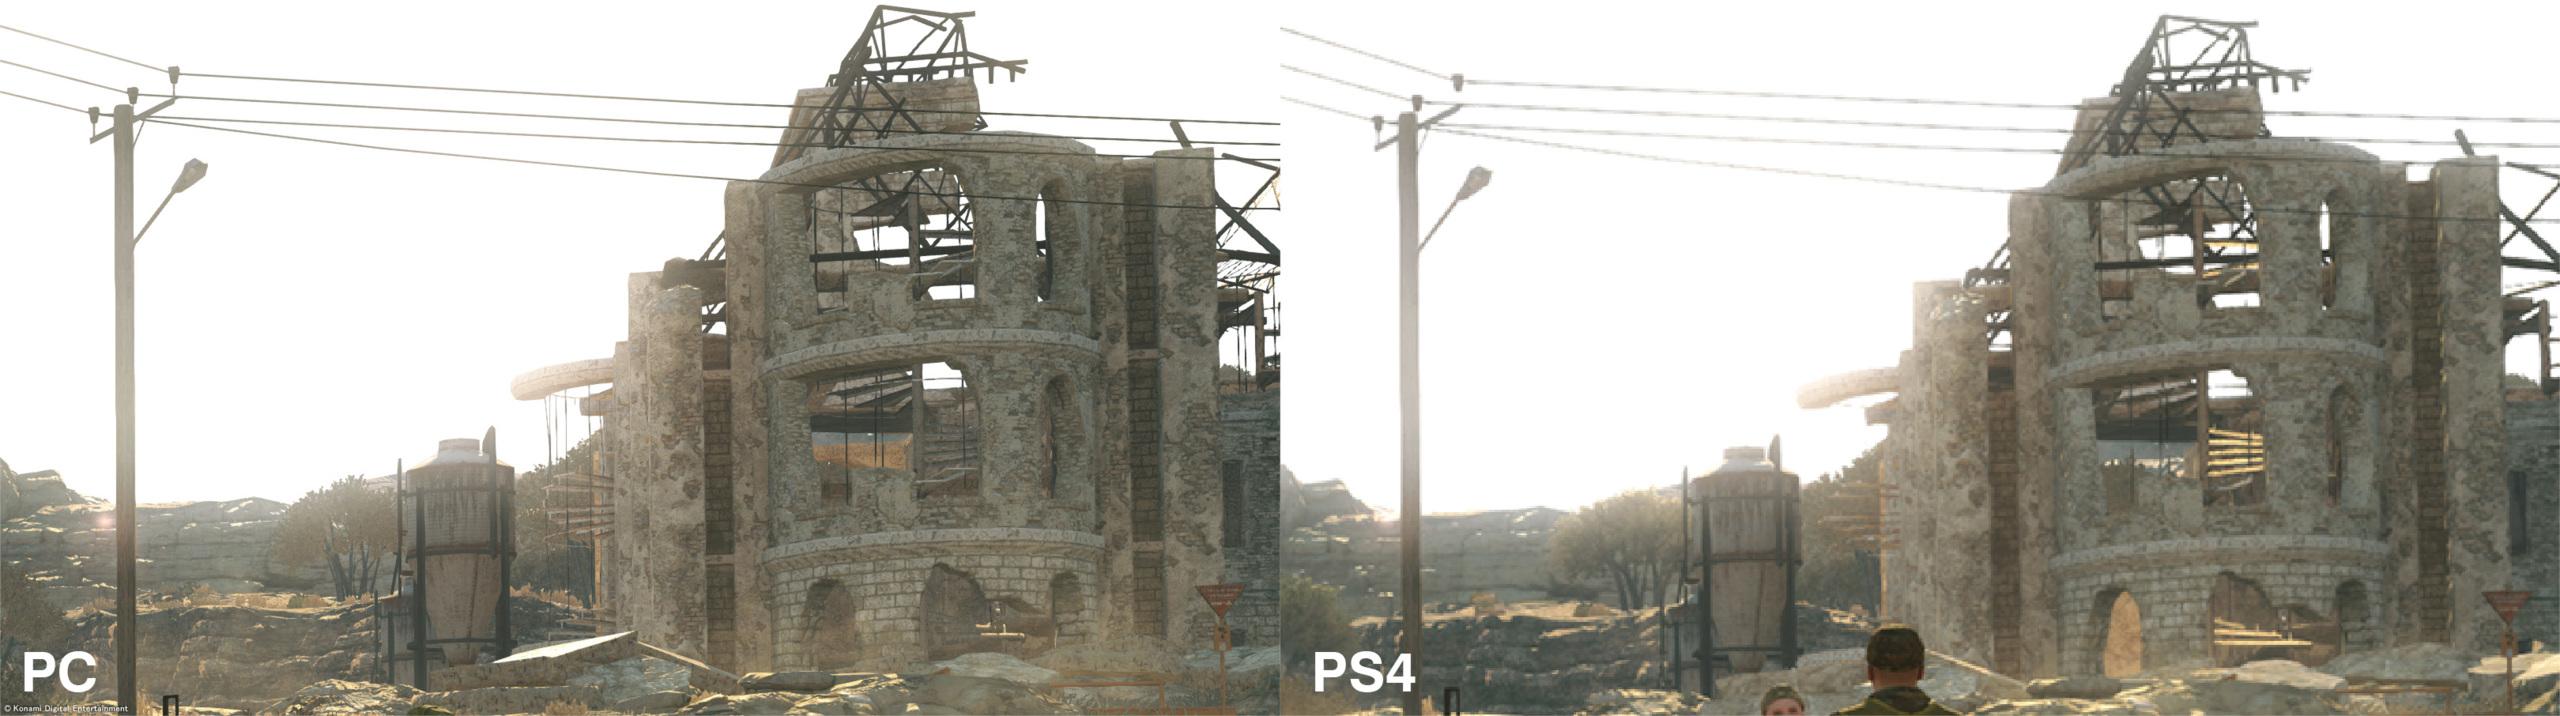 Foto de Metal Gear Solid V: The Phantom Pain (23/24)